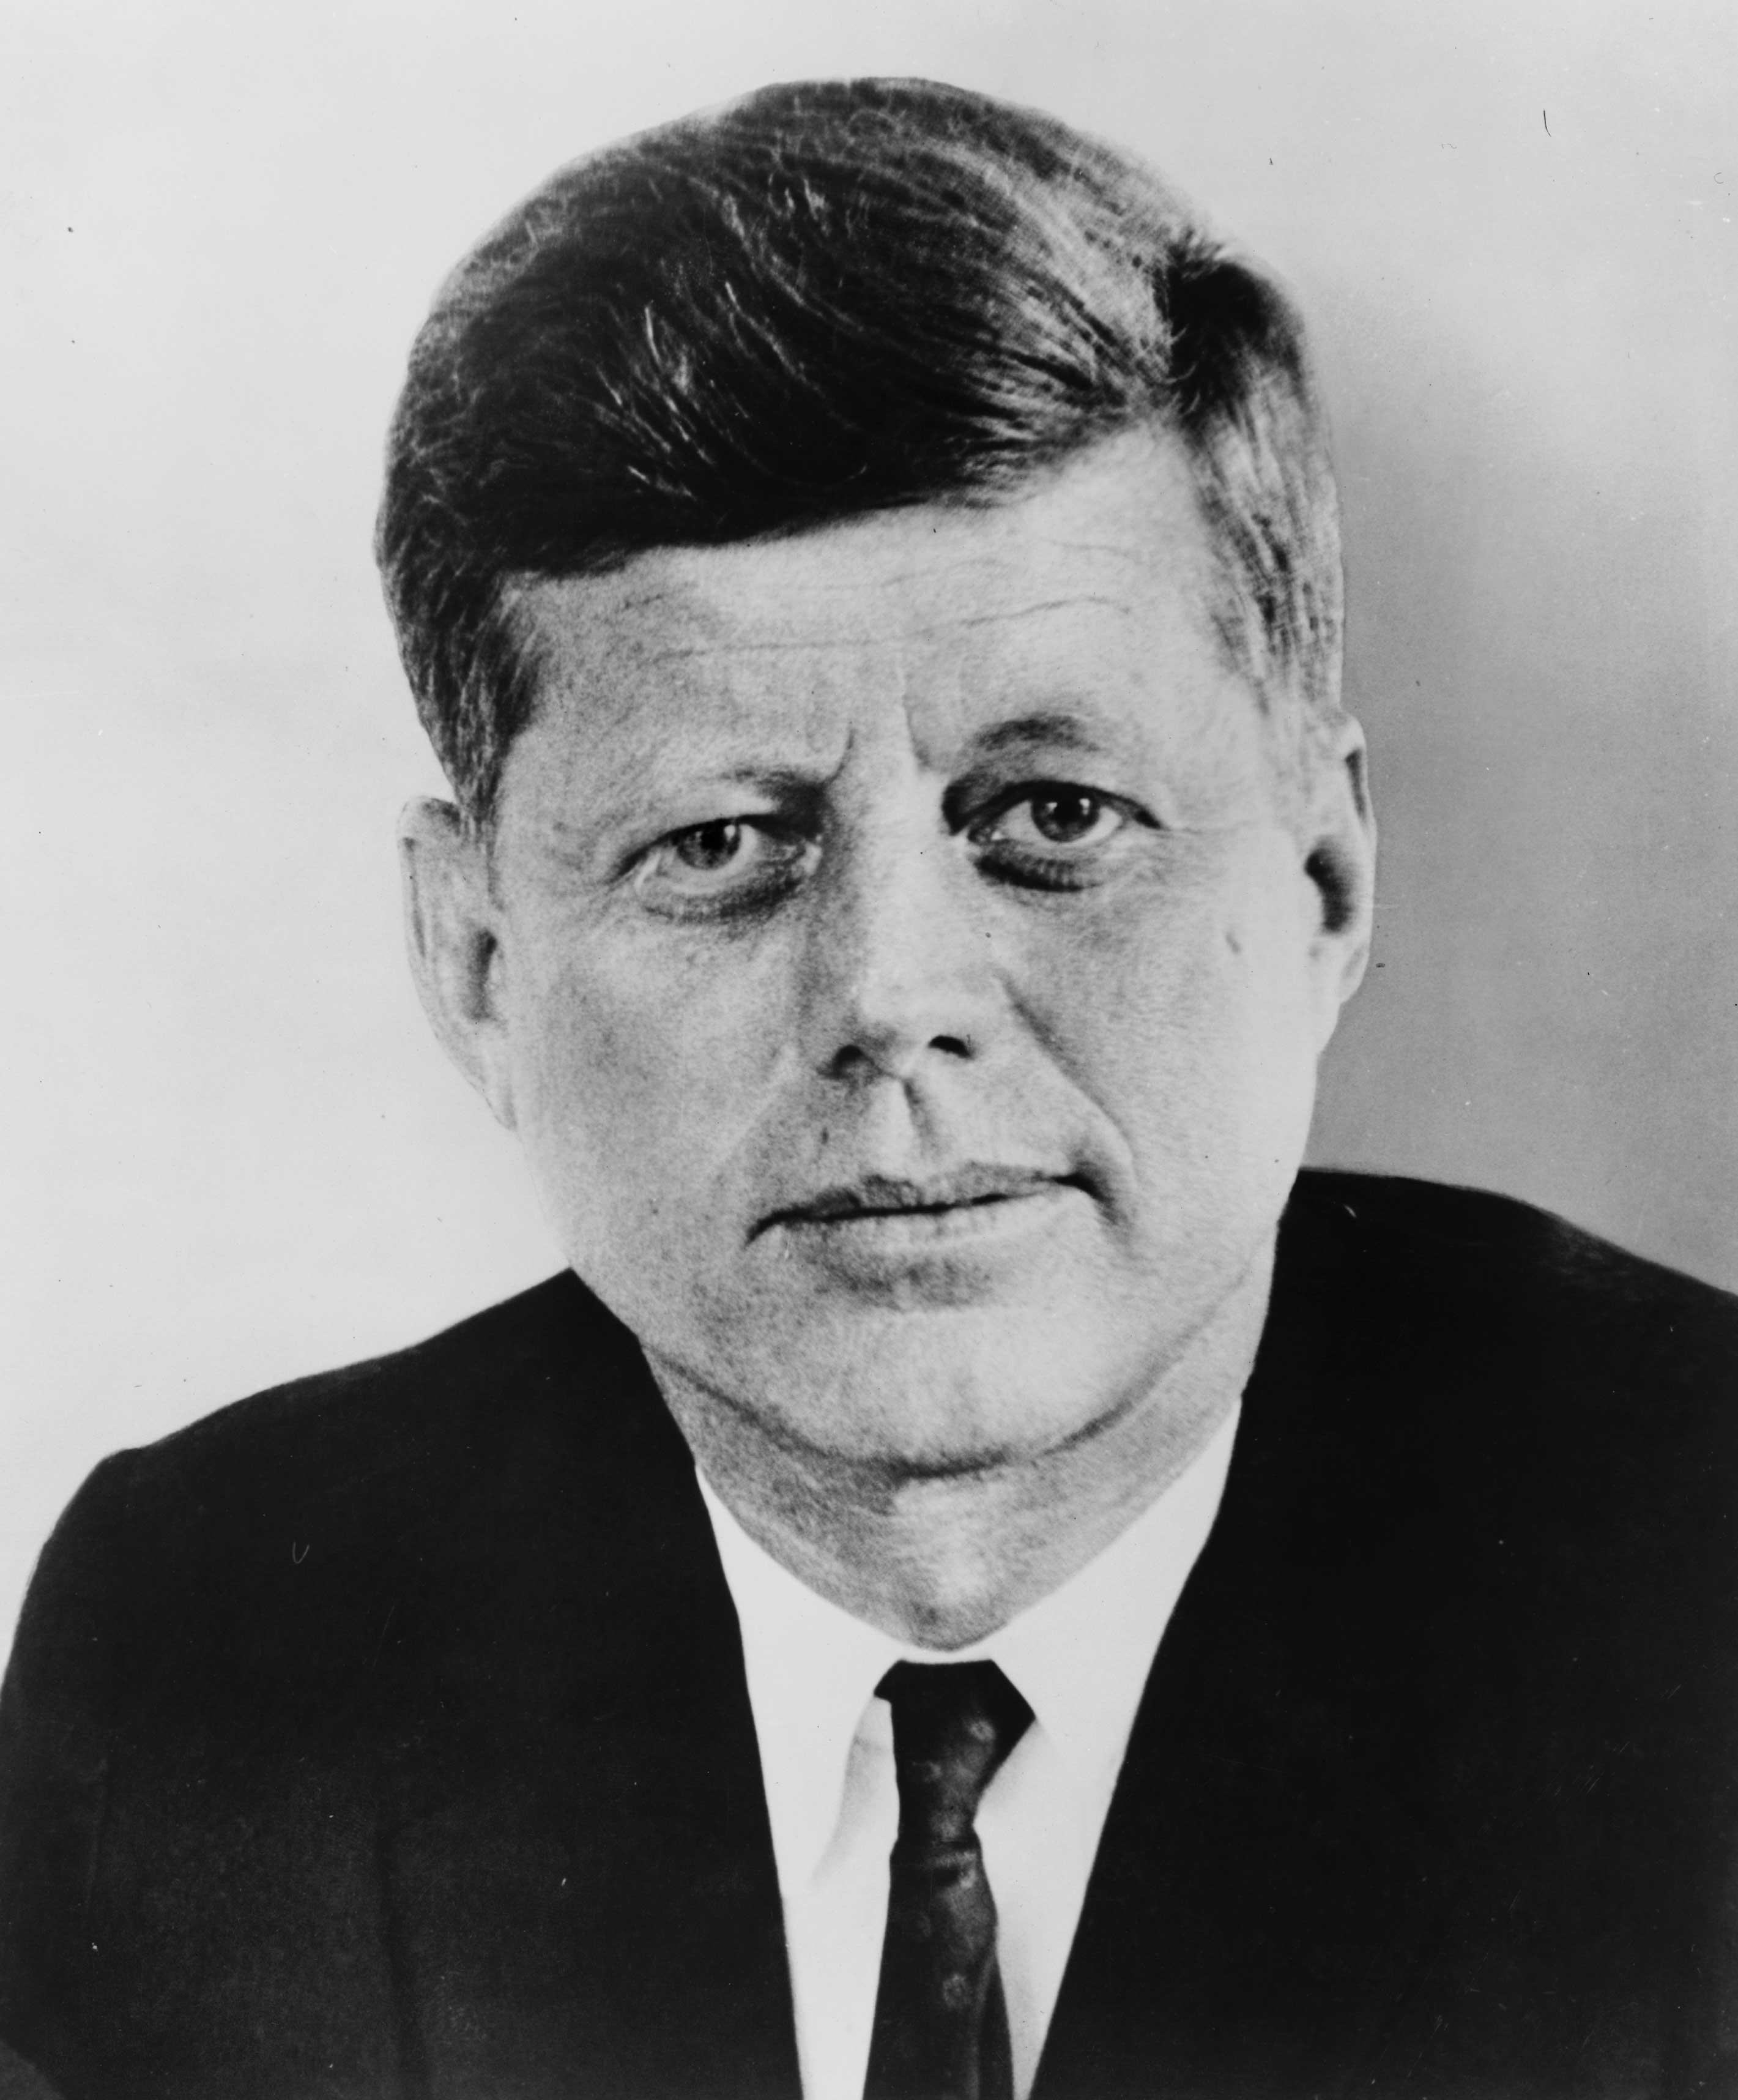 Declassified Titkosítás feloldva_Kennedy